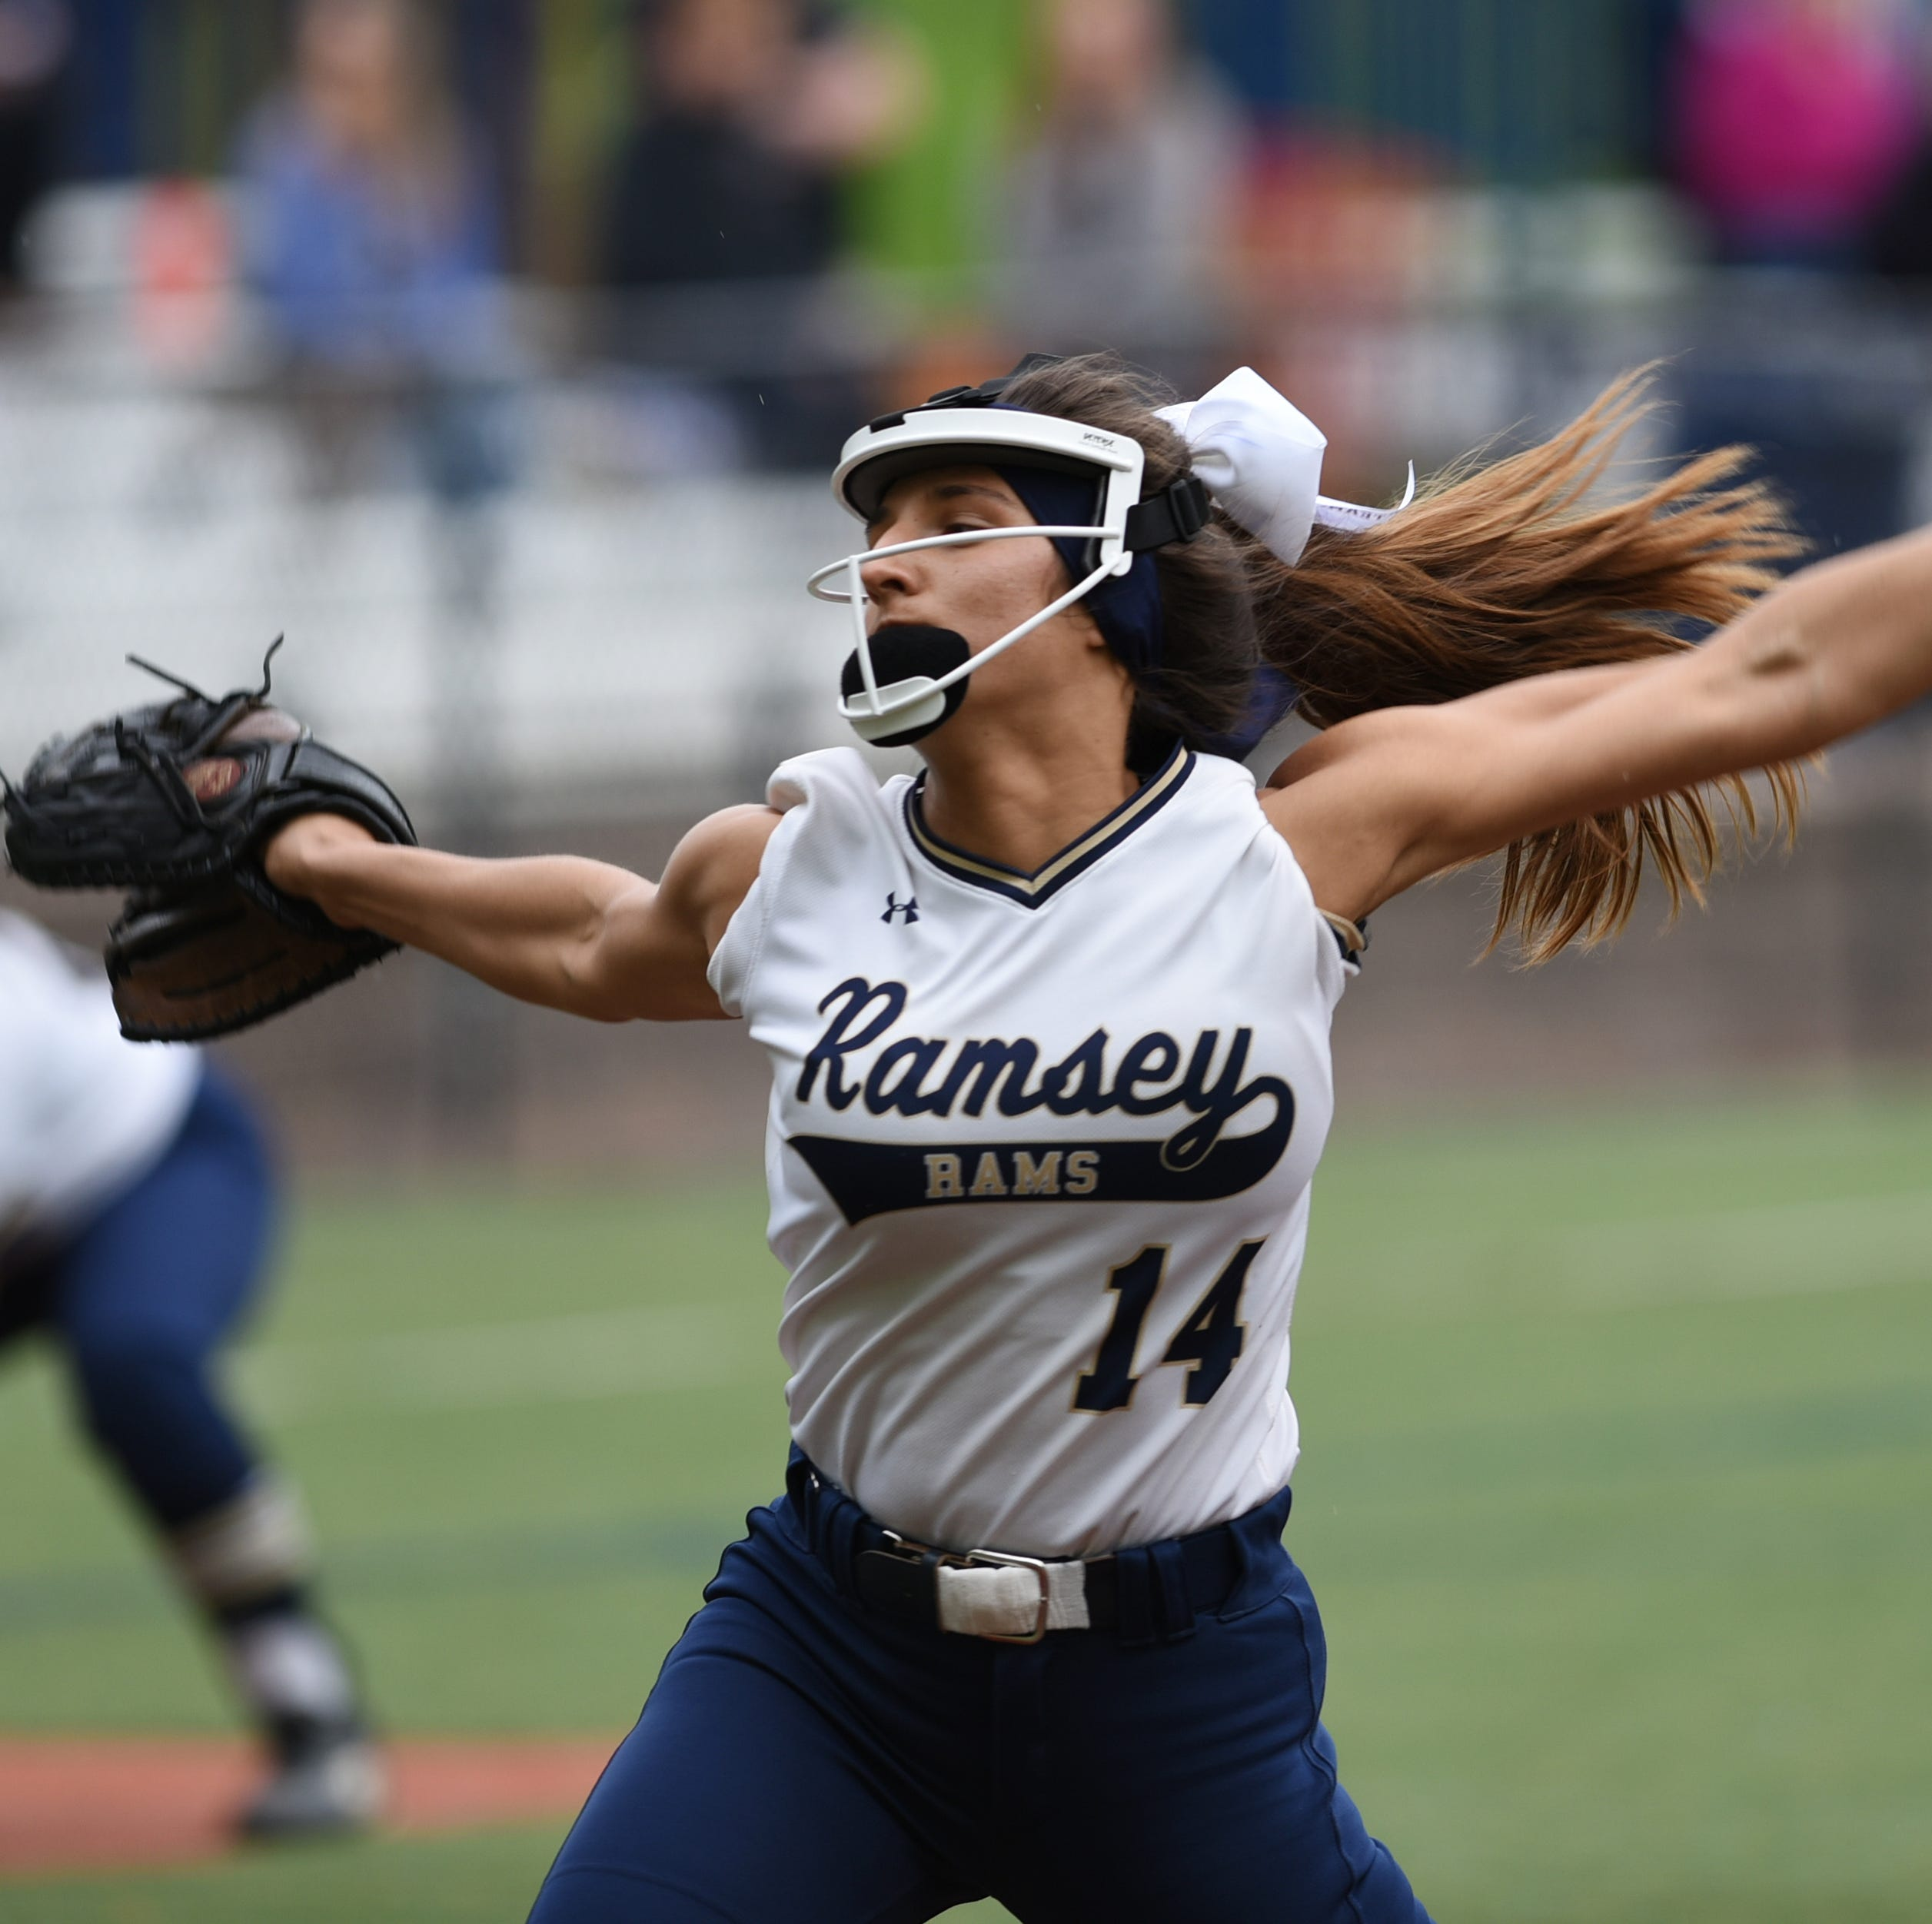 Softball: Umpire Jim Busch recalled fondly, Angela Lignelli's motor, Indian Hills' streak